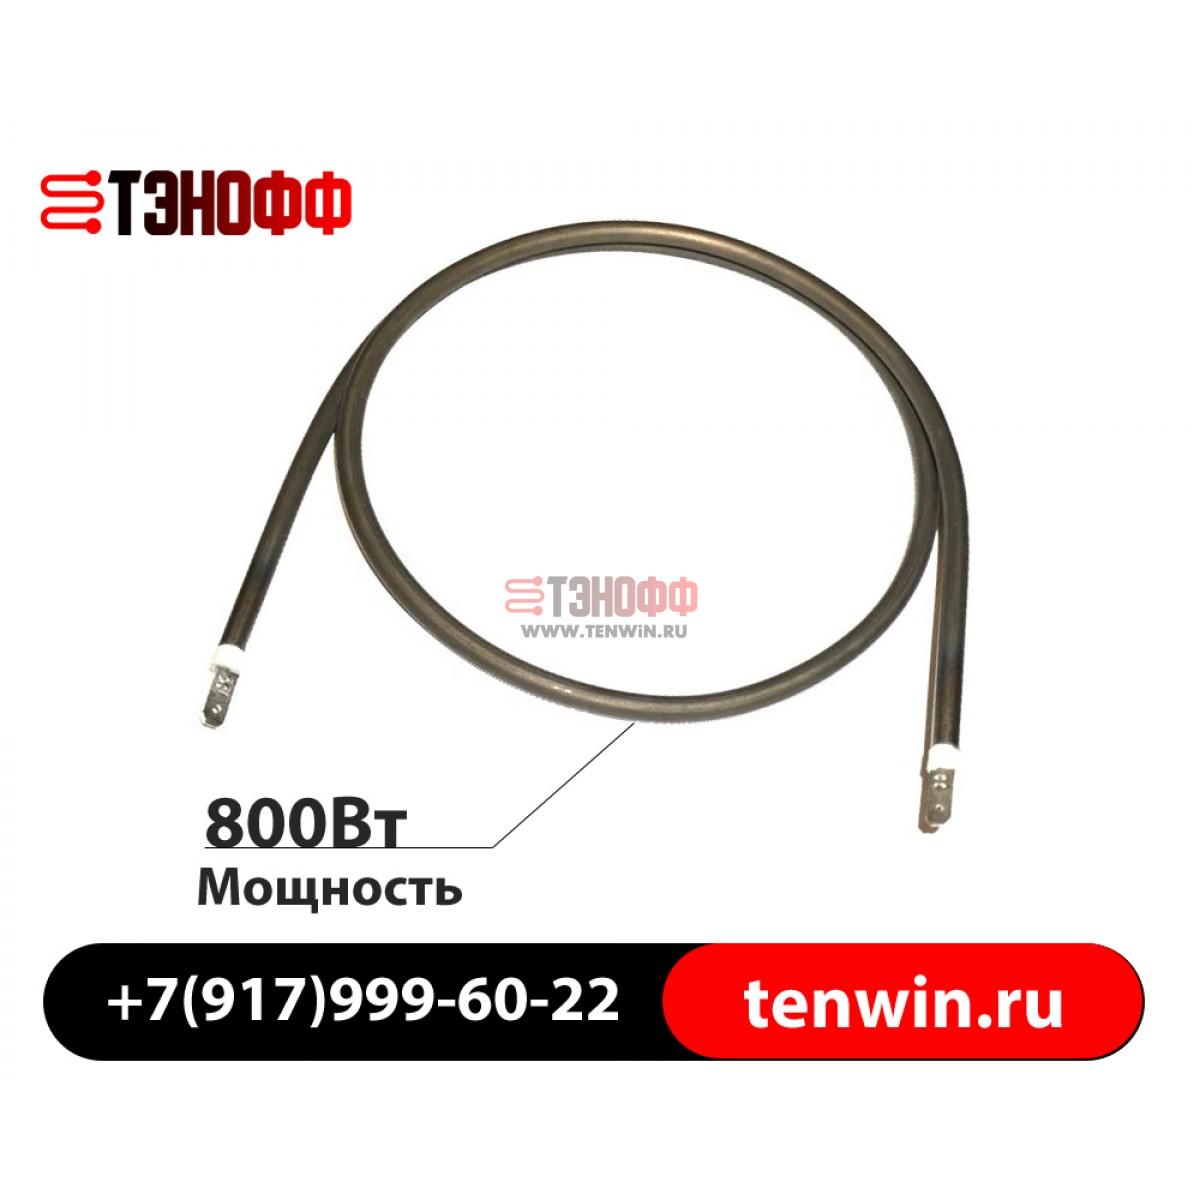 ТЭН 800Вт воздушный гибкий - длина 800мм